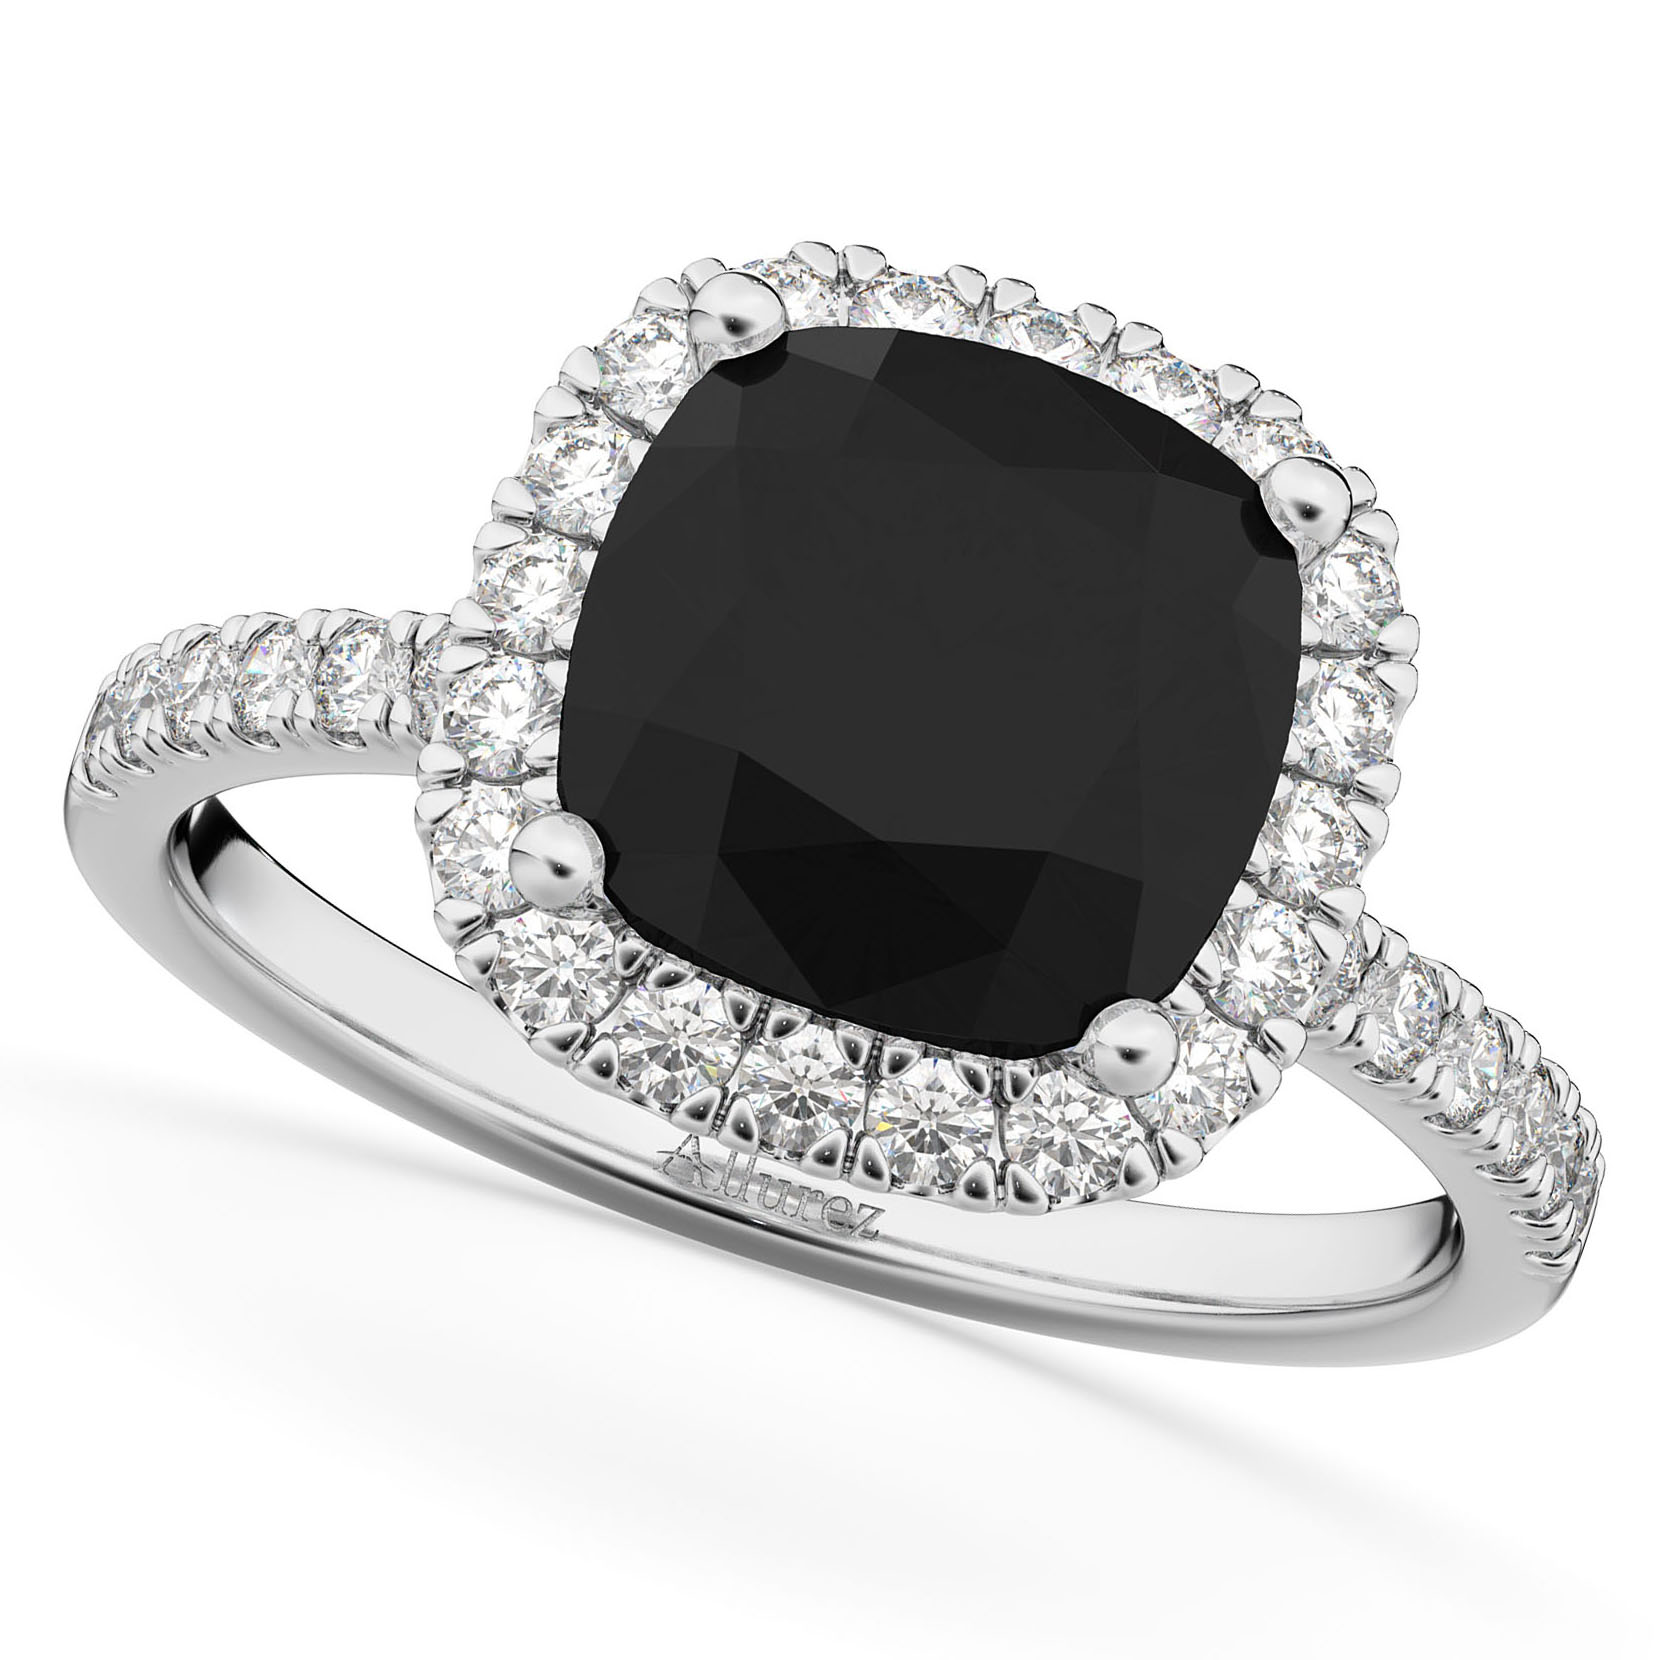 Cushion Cut Black Diamond Engagement Ring 14k White Gold (2.55ct)